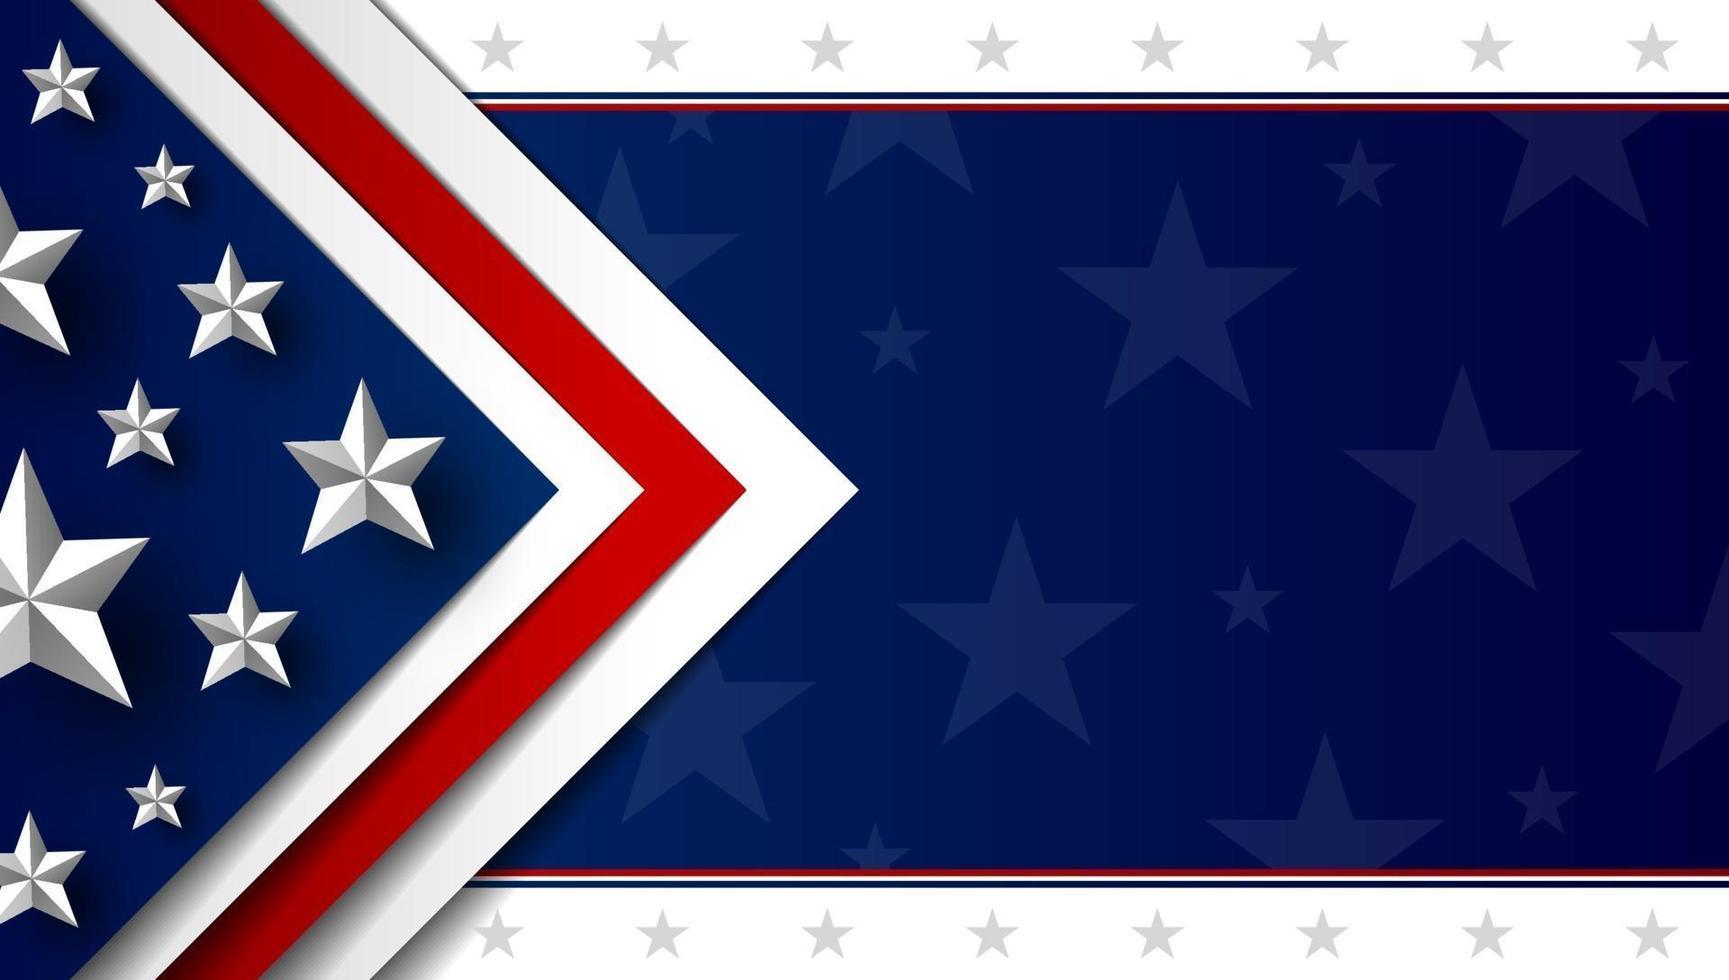 USA Hintergrund Design Vektor-Illustration vektor